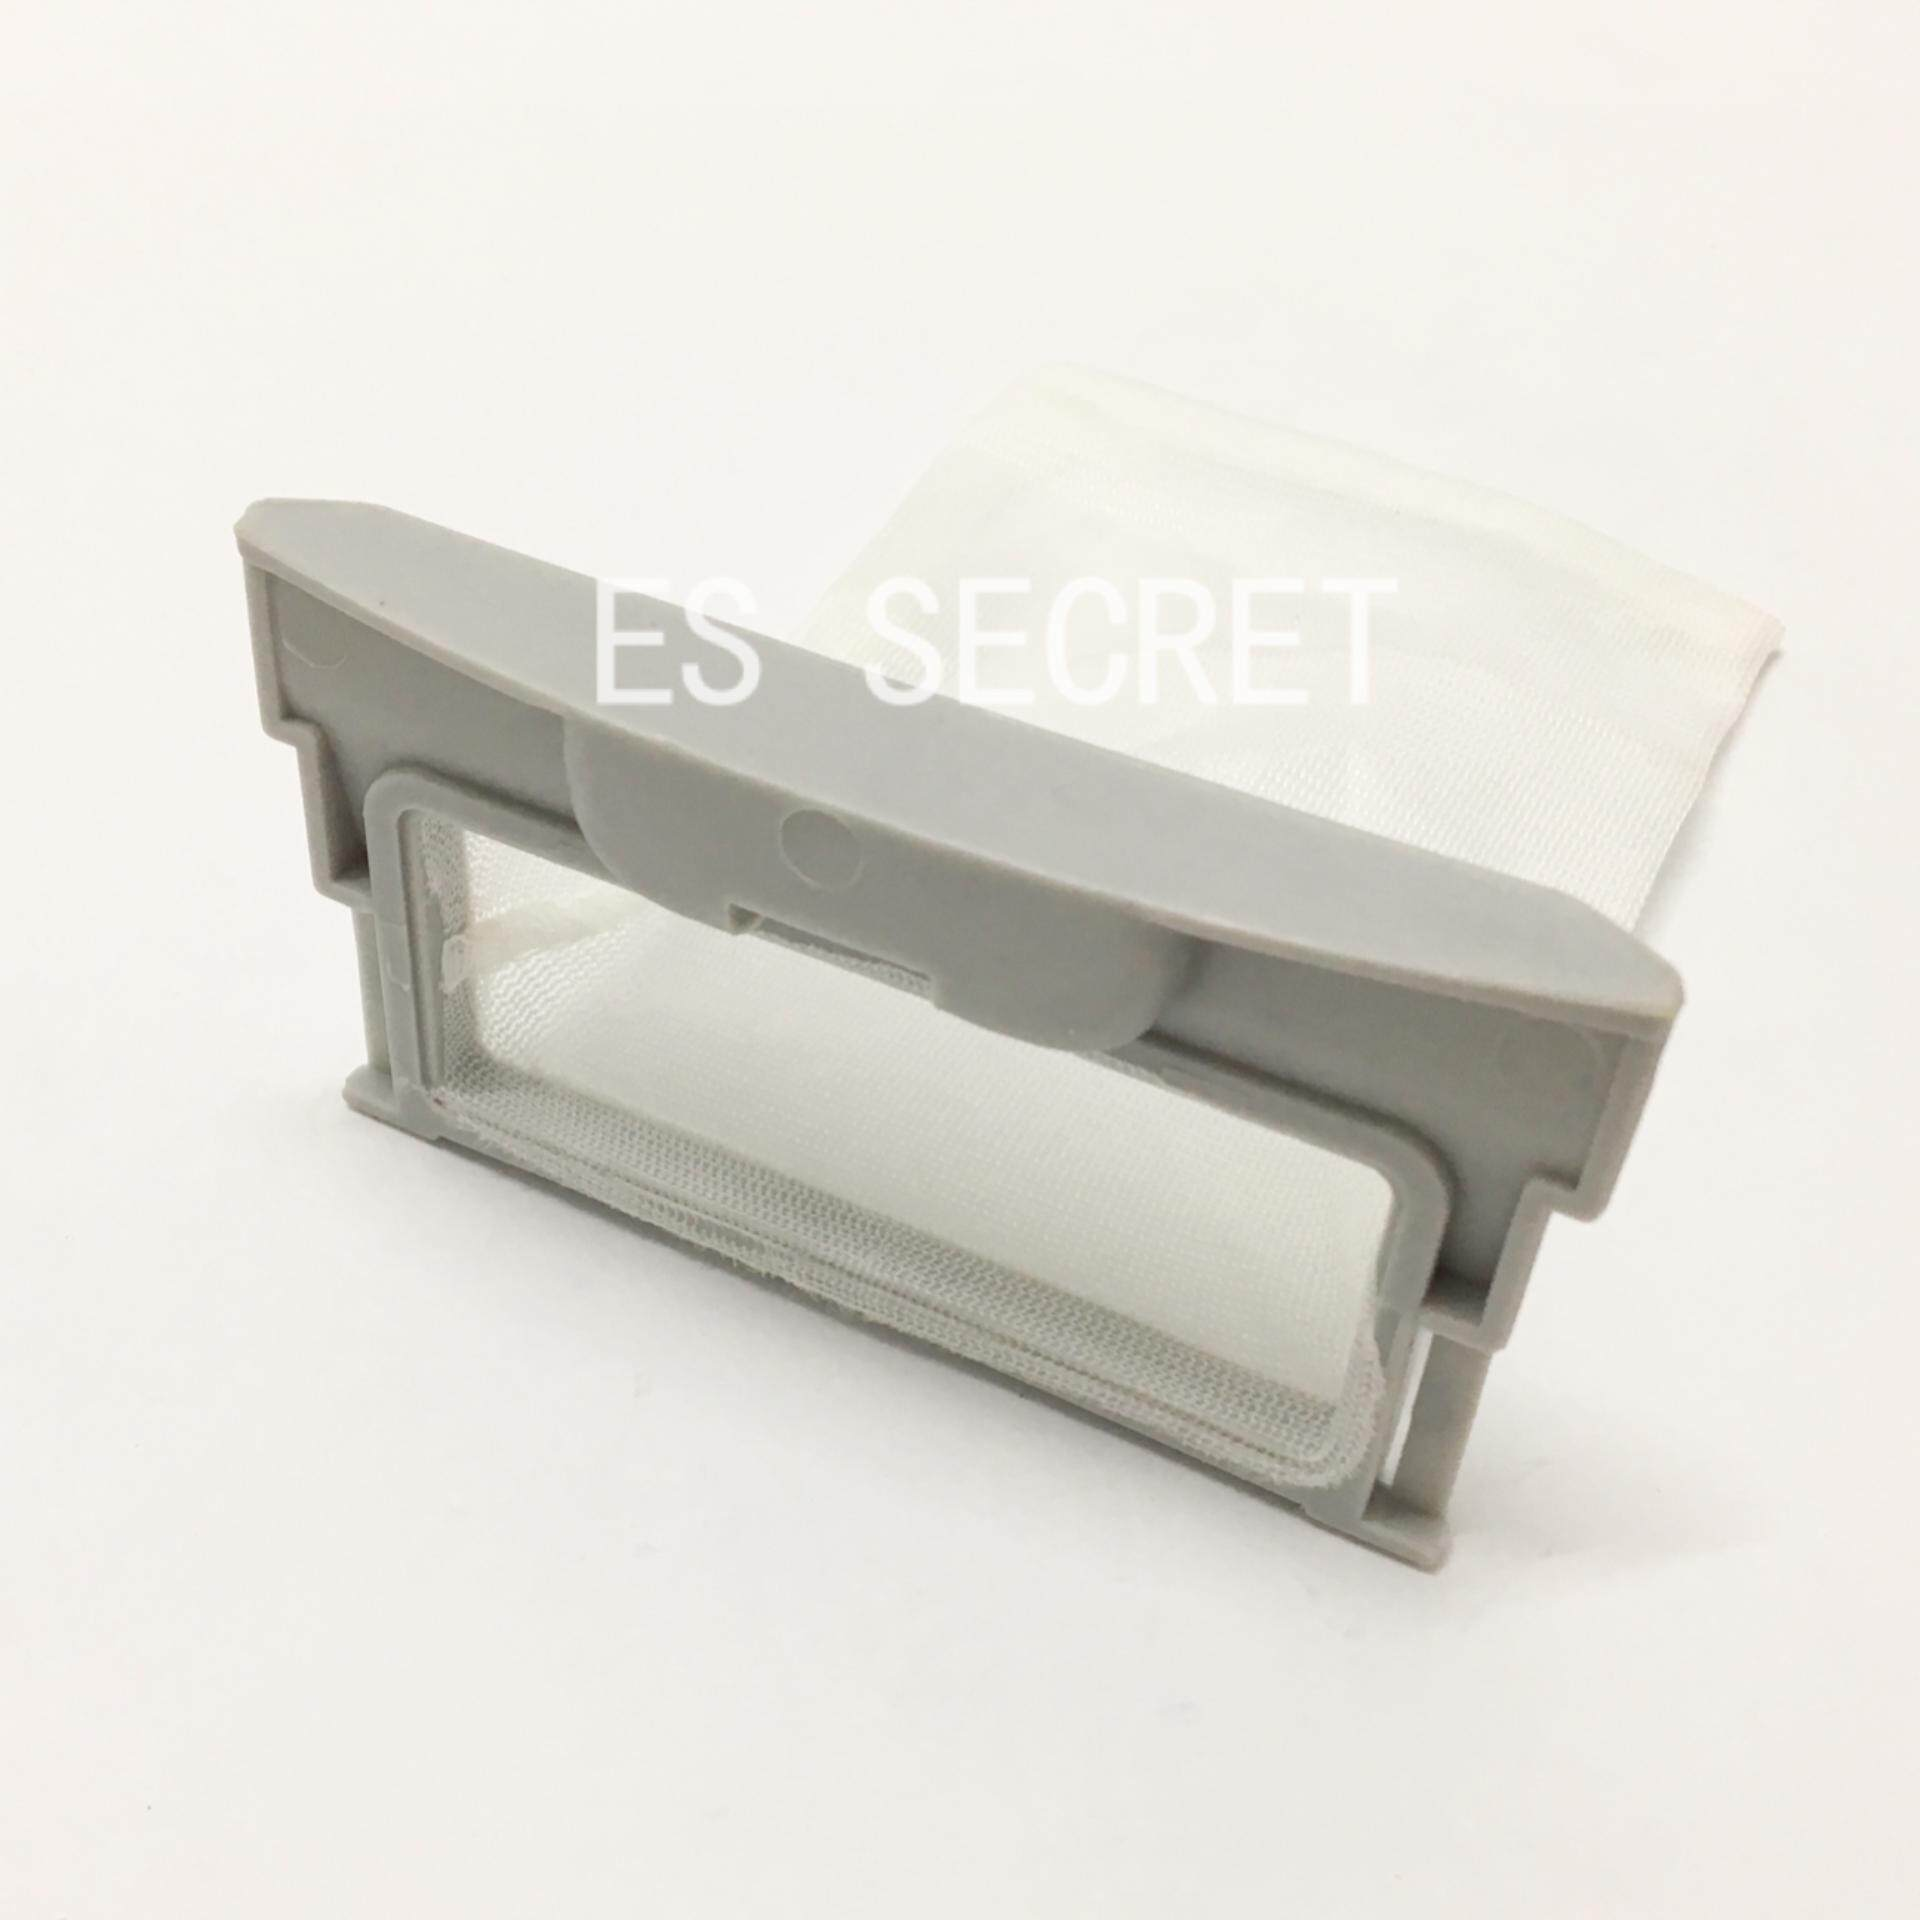 Sharp Washing Machine Dust Filter BUY 1 FREE 1